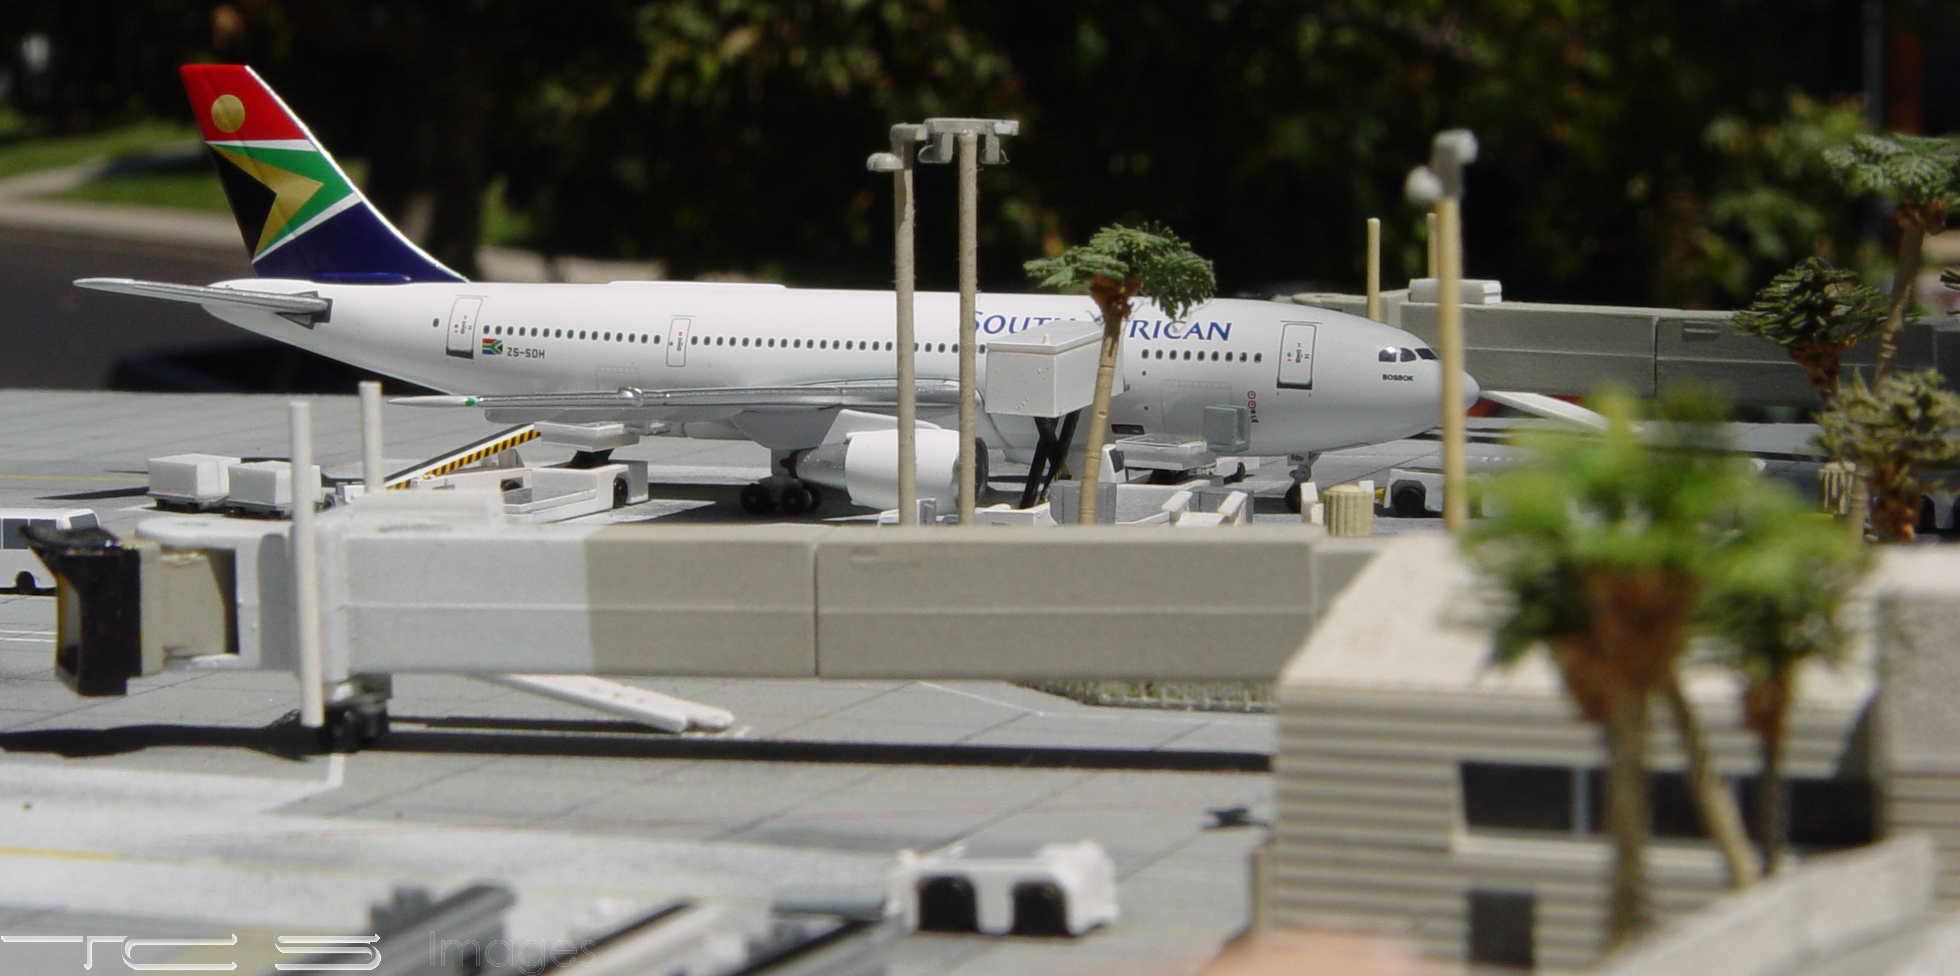 South African Airways A300B4-203